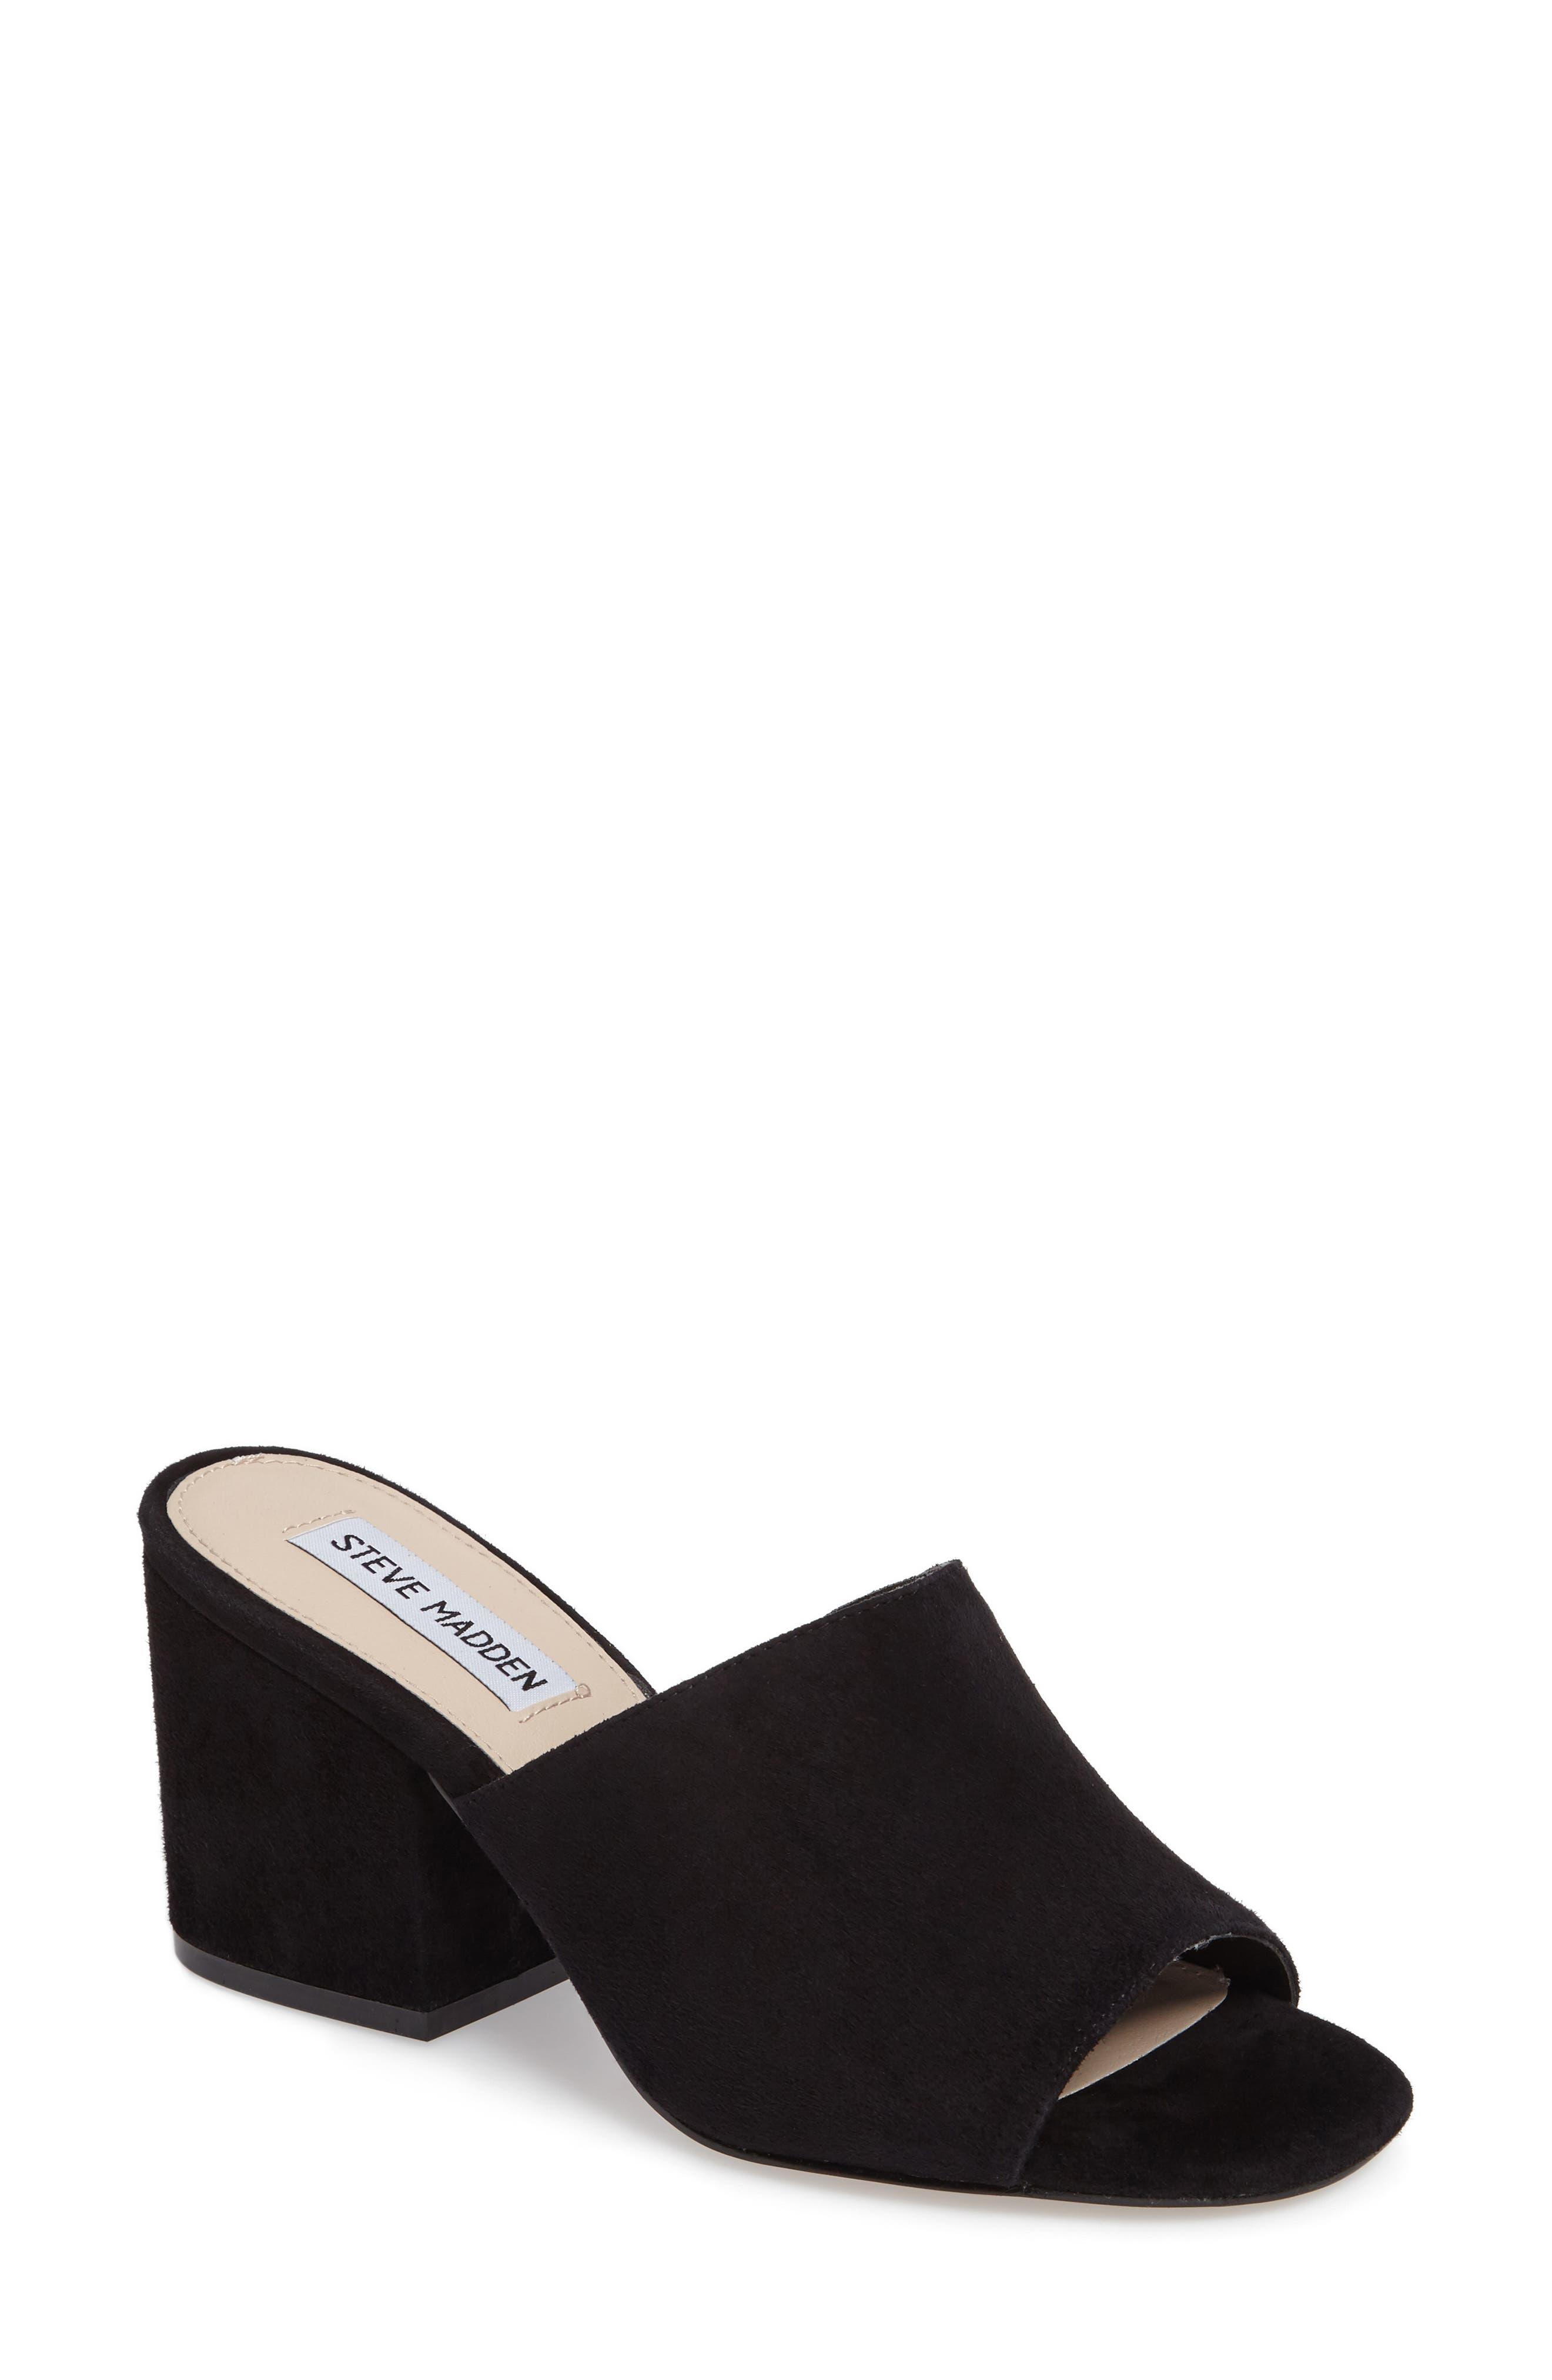 Dalis Slide Sandal,                         Main,                         color, 006